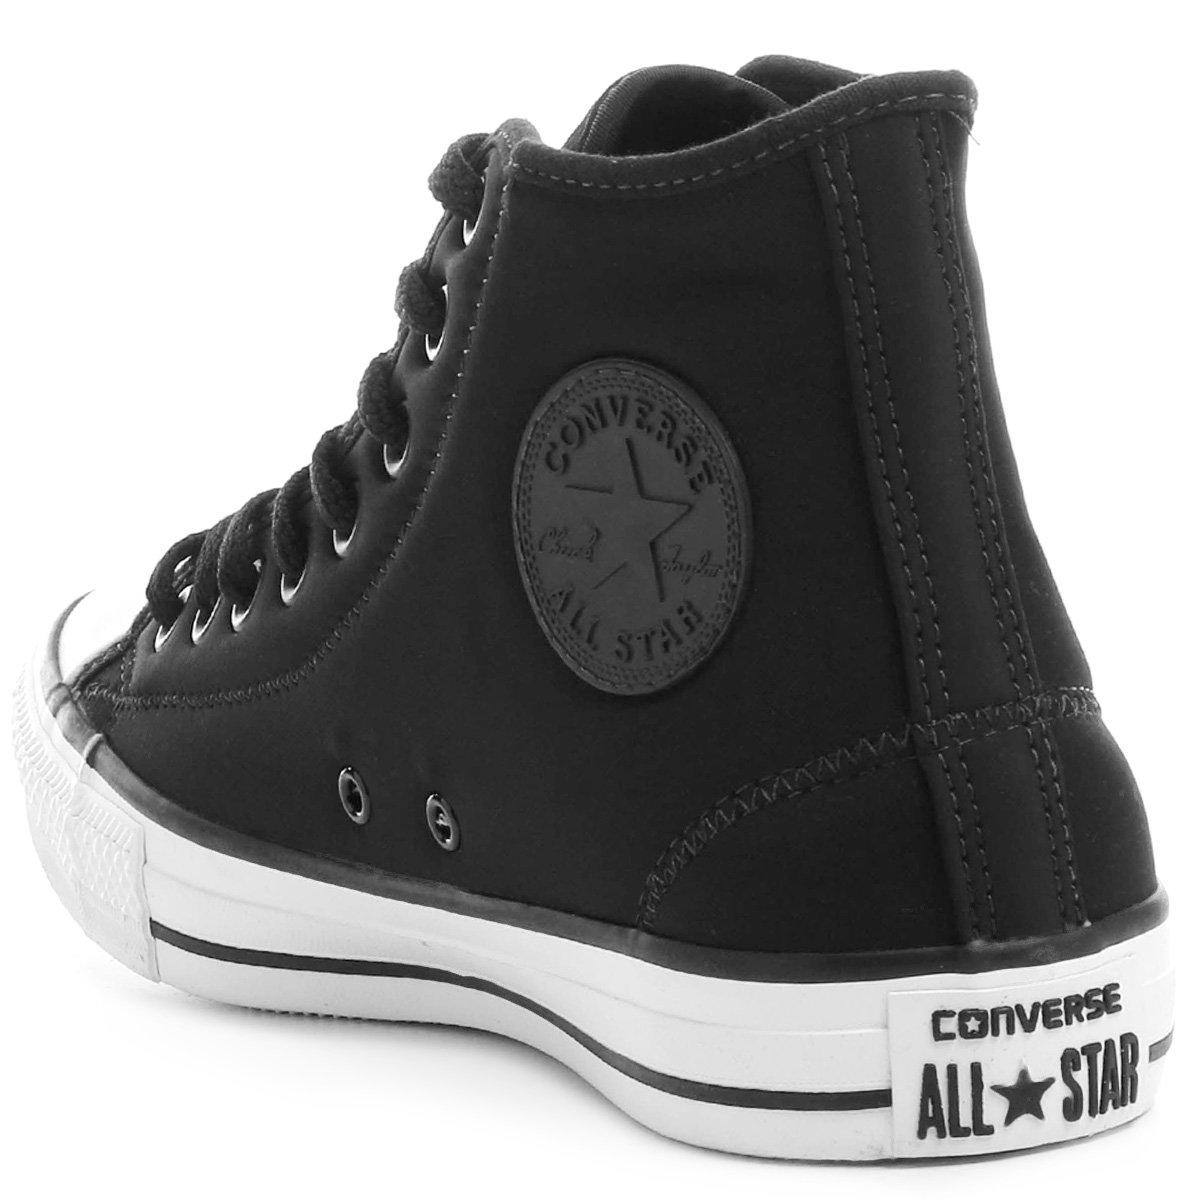 69078e5b9 Tênis Converse Chuck Taylor All Star Hi Neoprene - Compre Agora ...